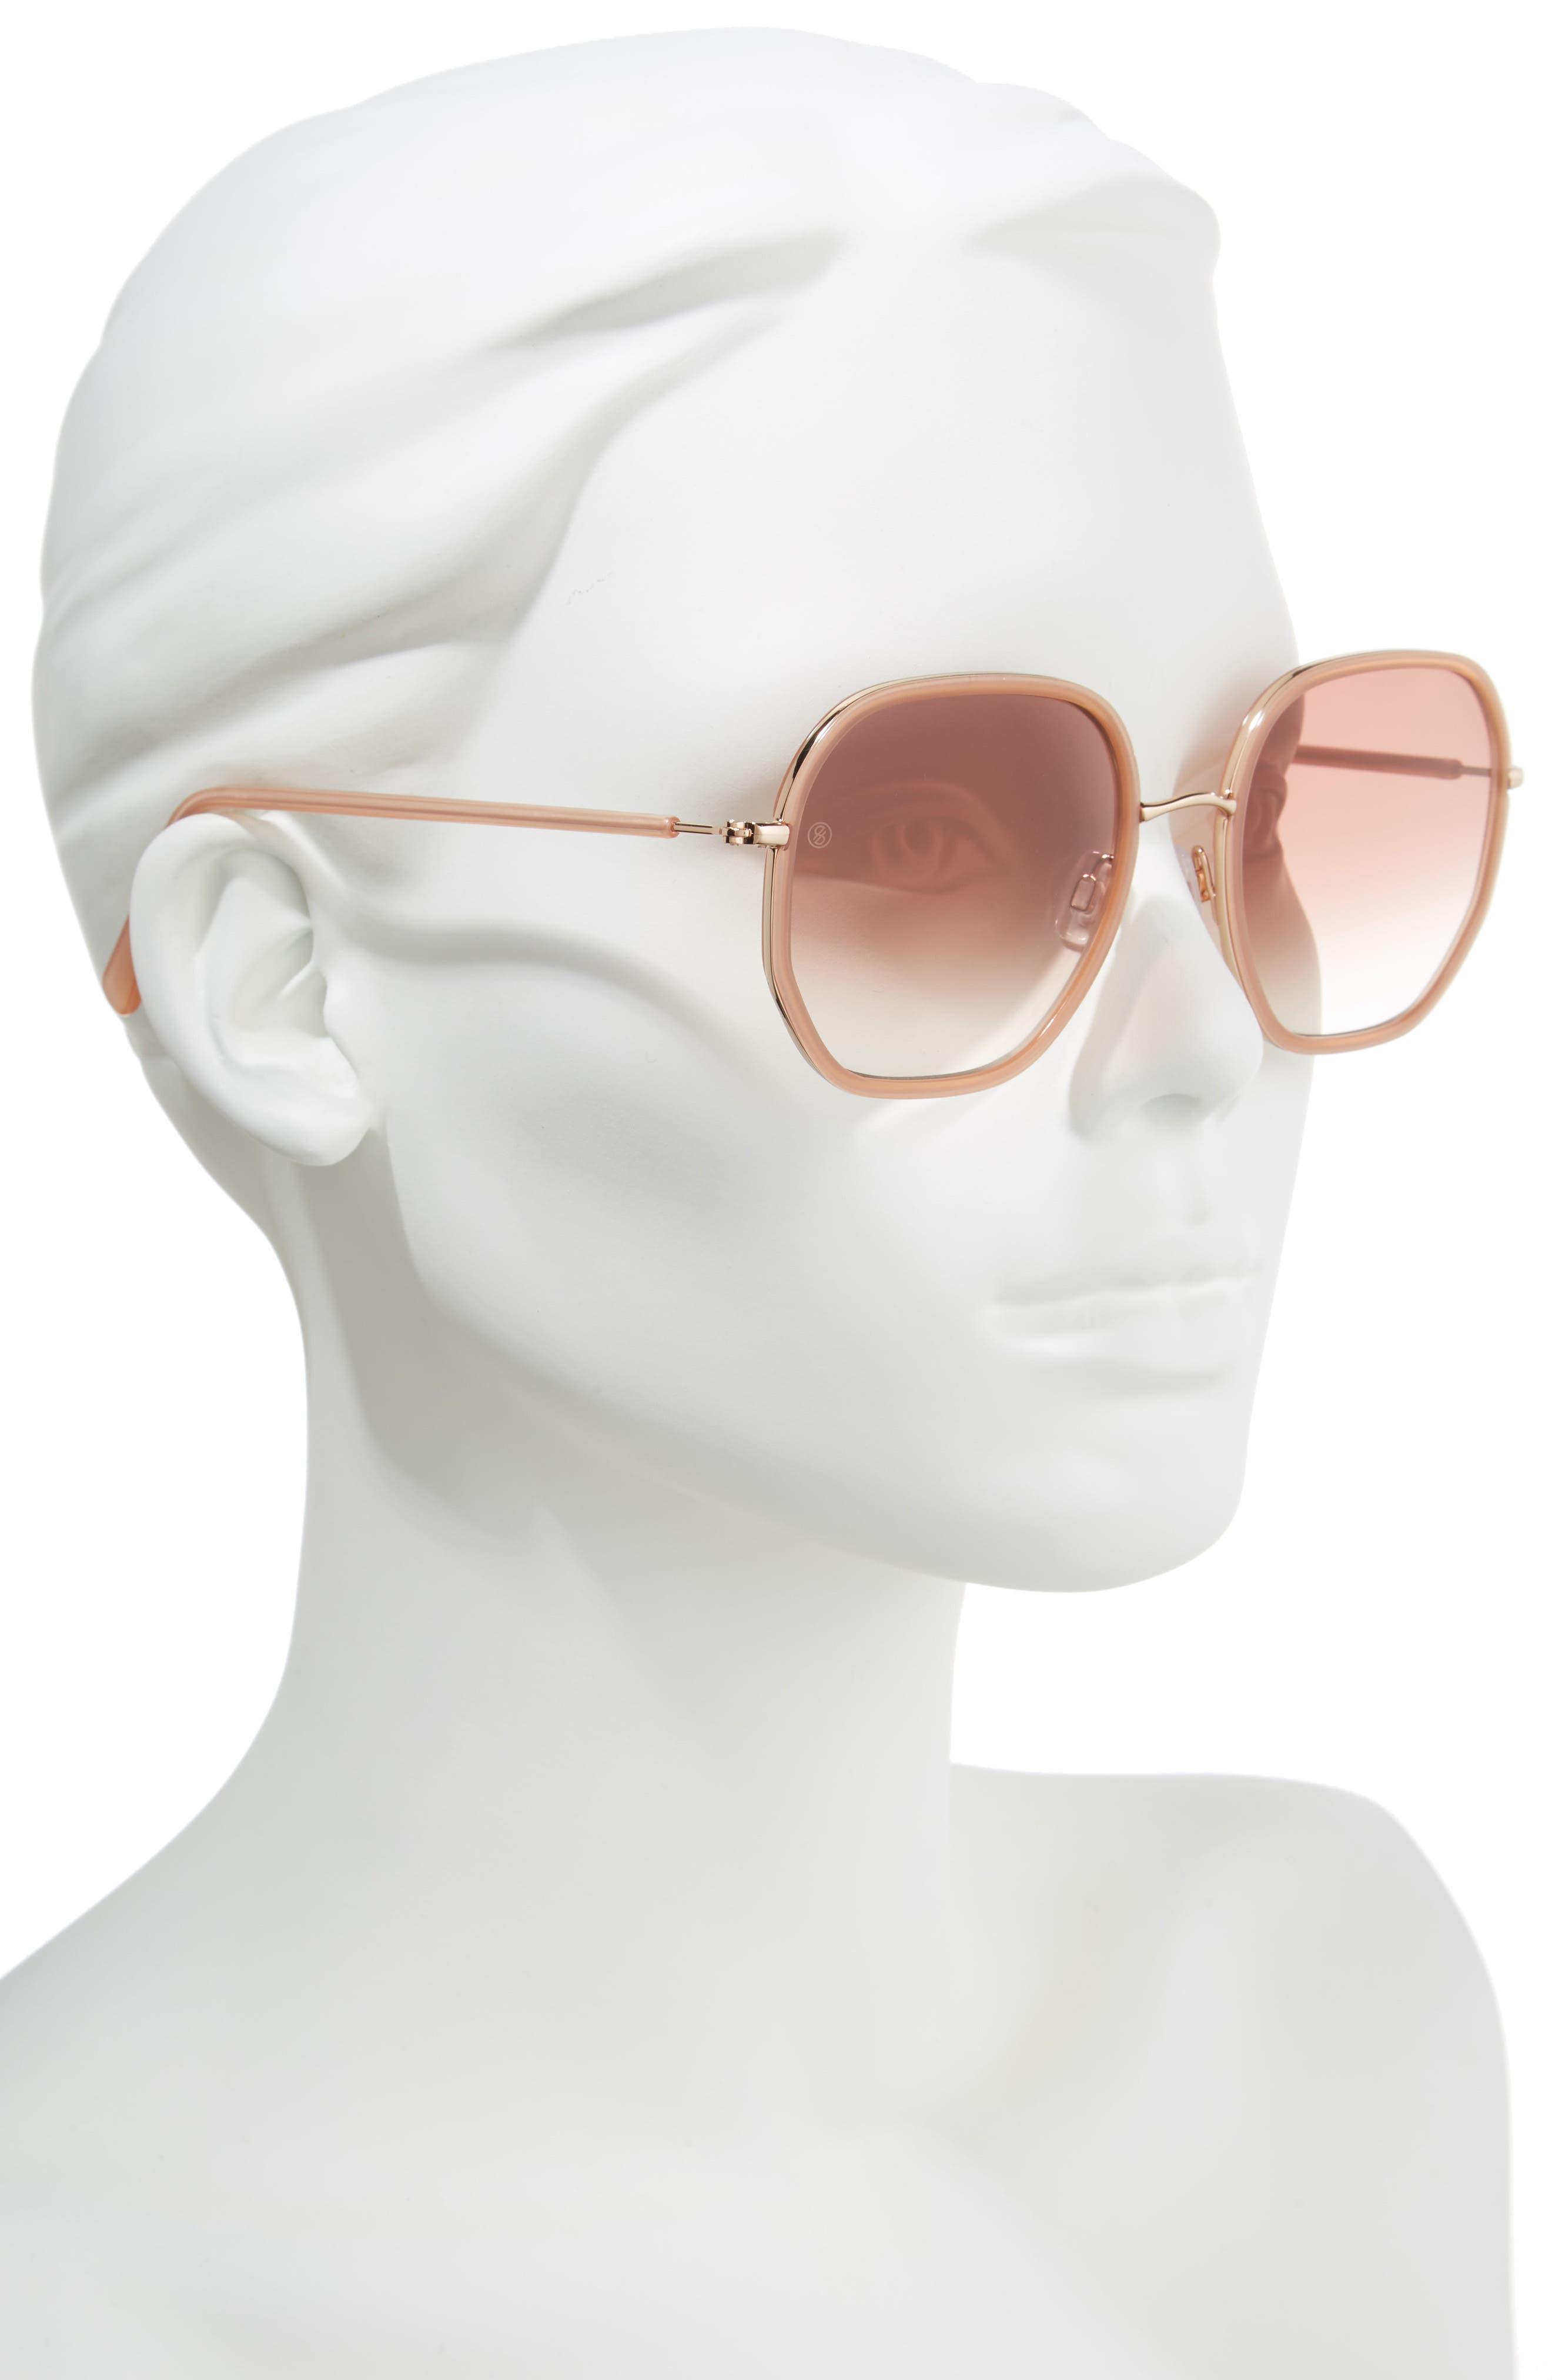 D'BLANC Rare Fortune 57mm Sunglasses,                             Alternate thumbnail 2, color,                             650